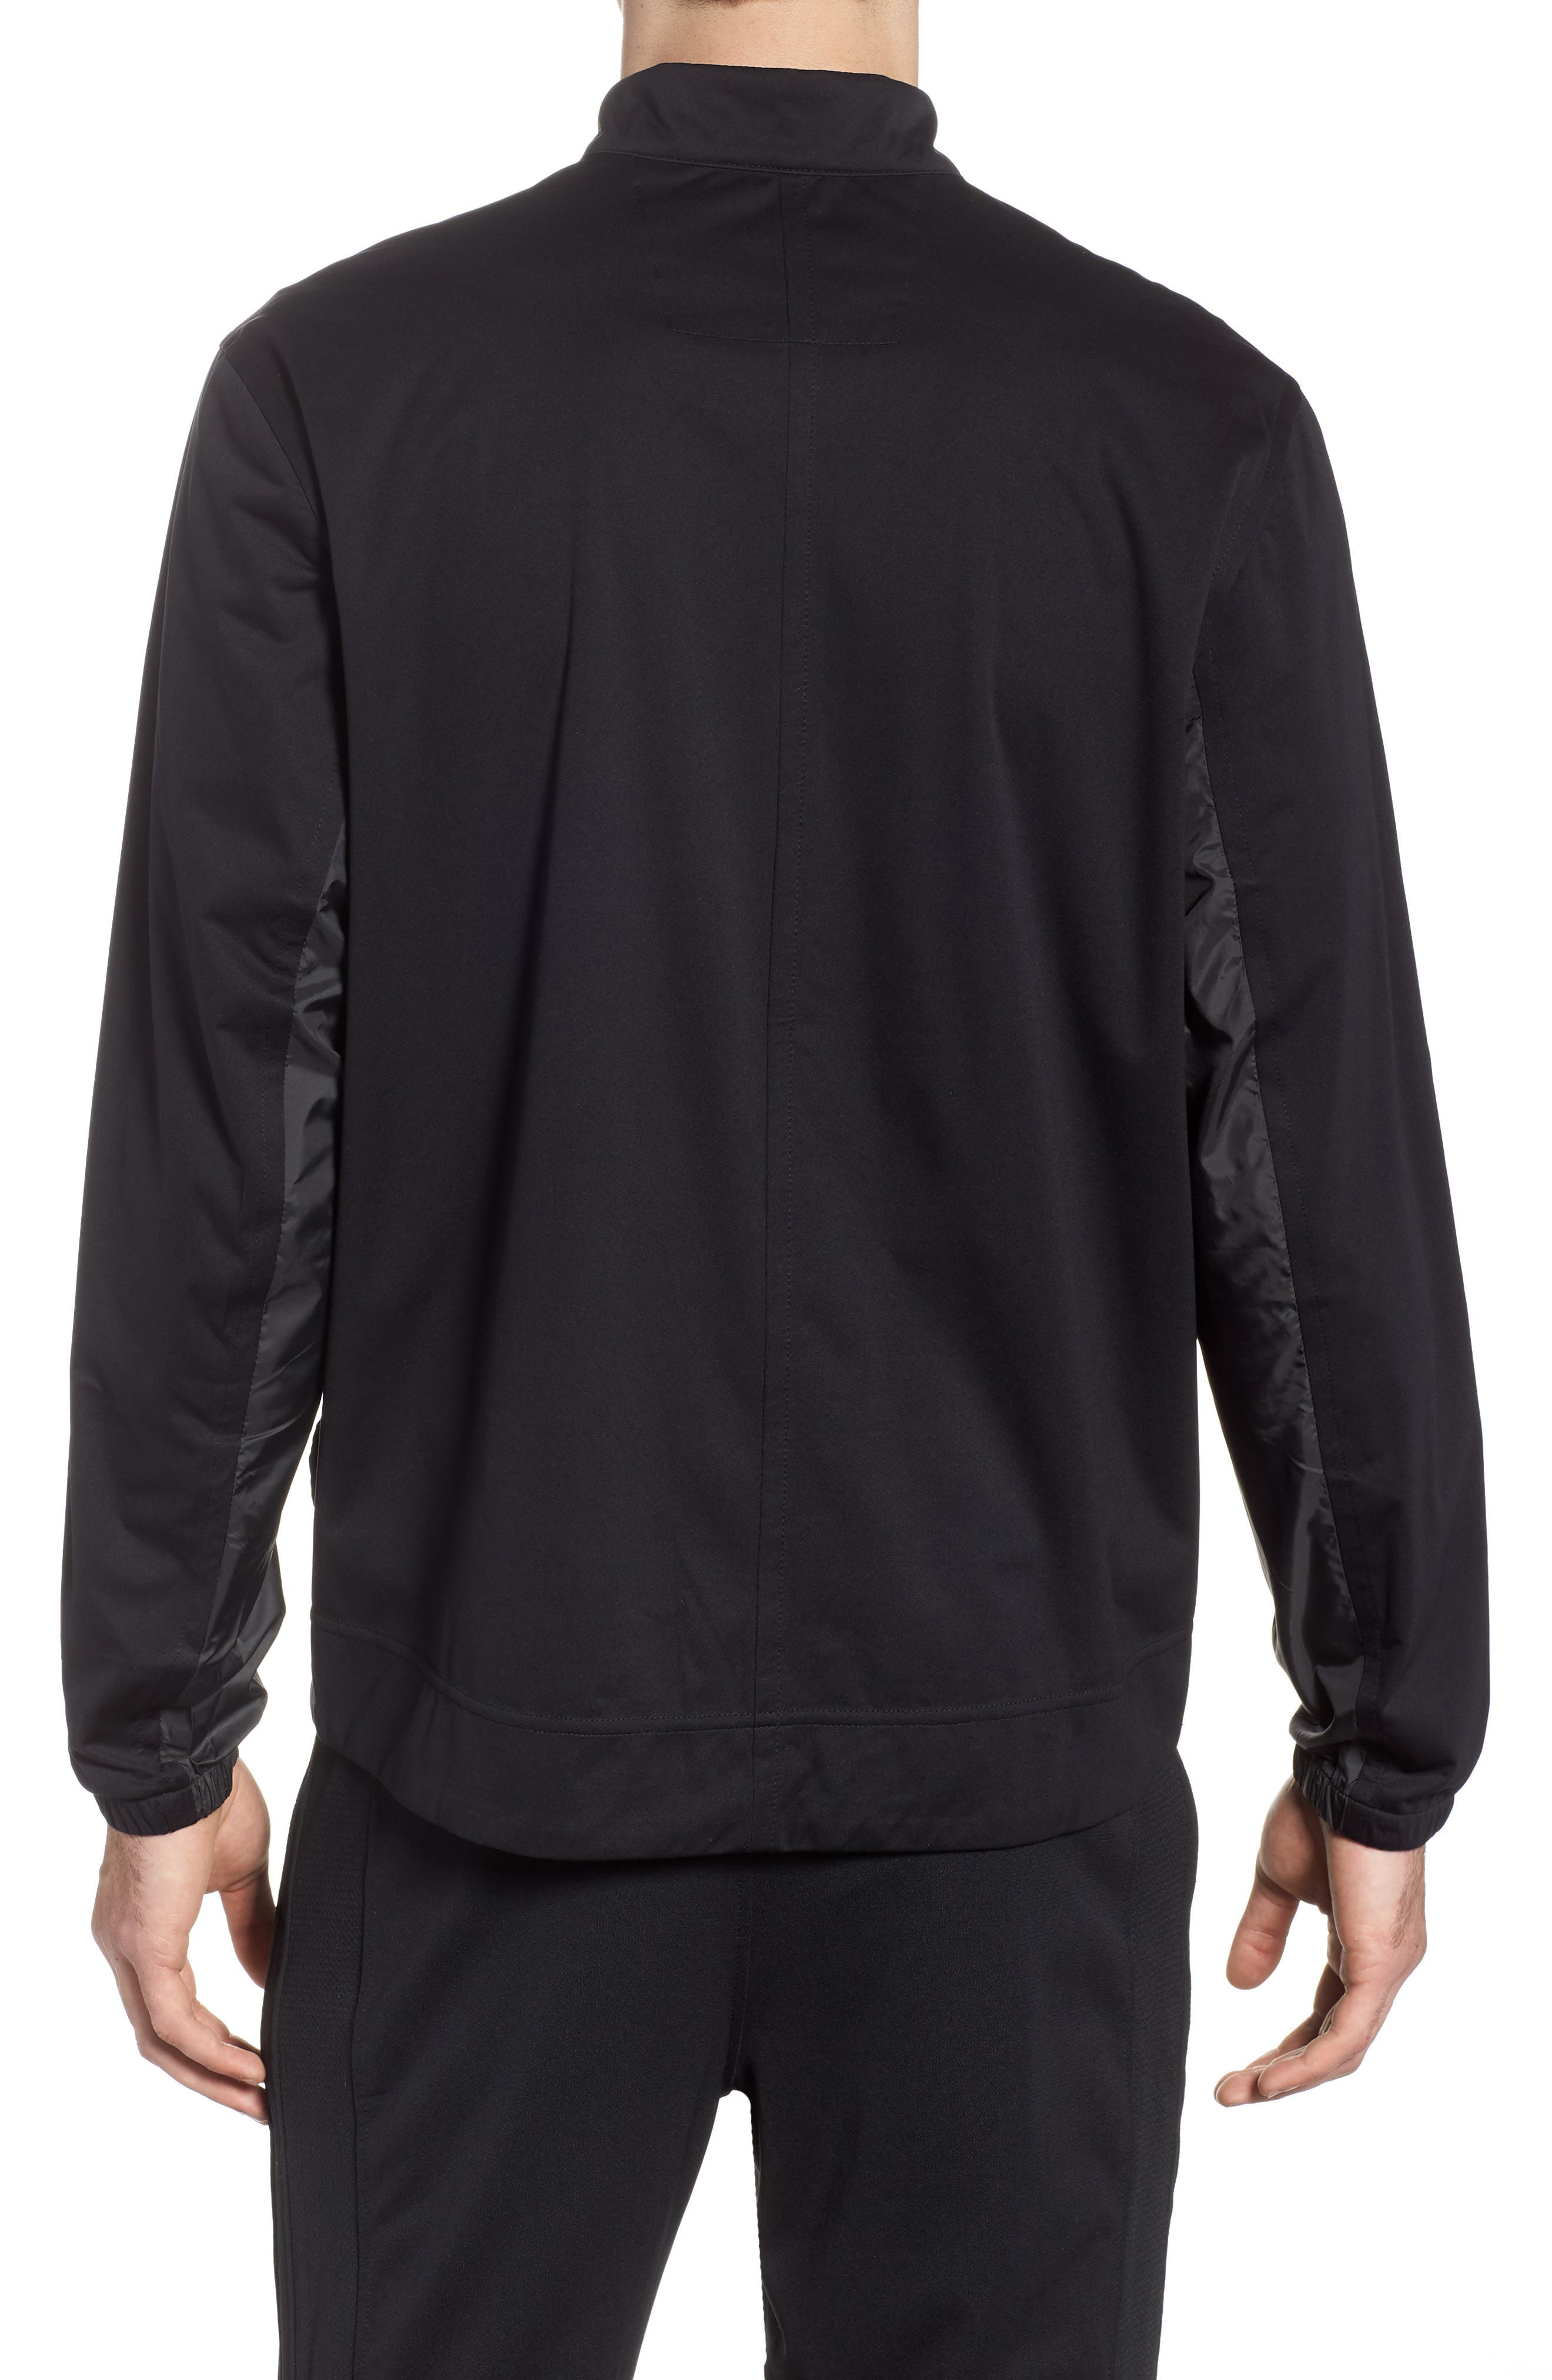 Shield Full Zip Golf Jacket,                             Alternate thumbnail 2, color,                             Black/ Silver